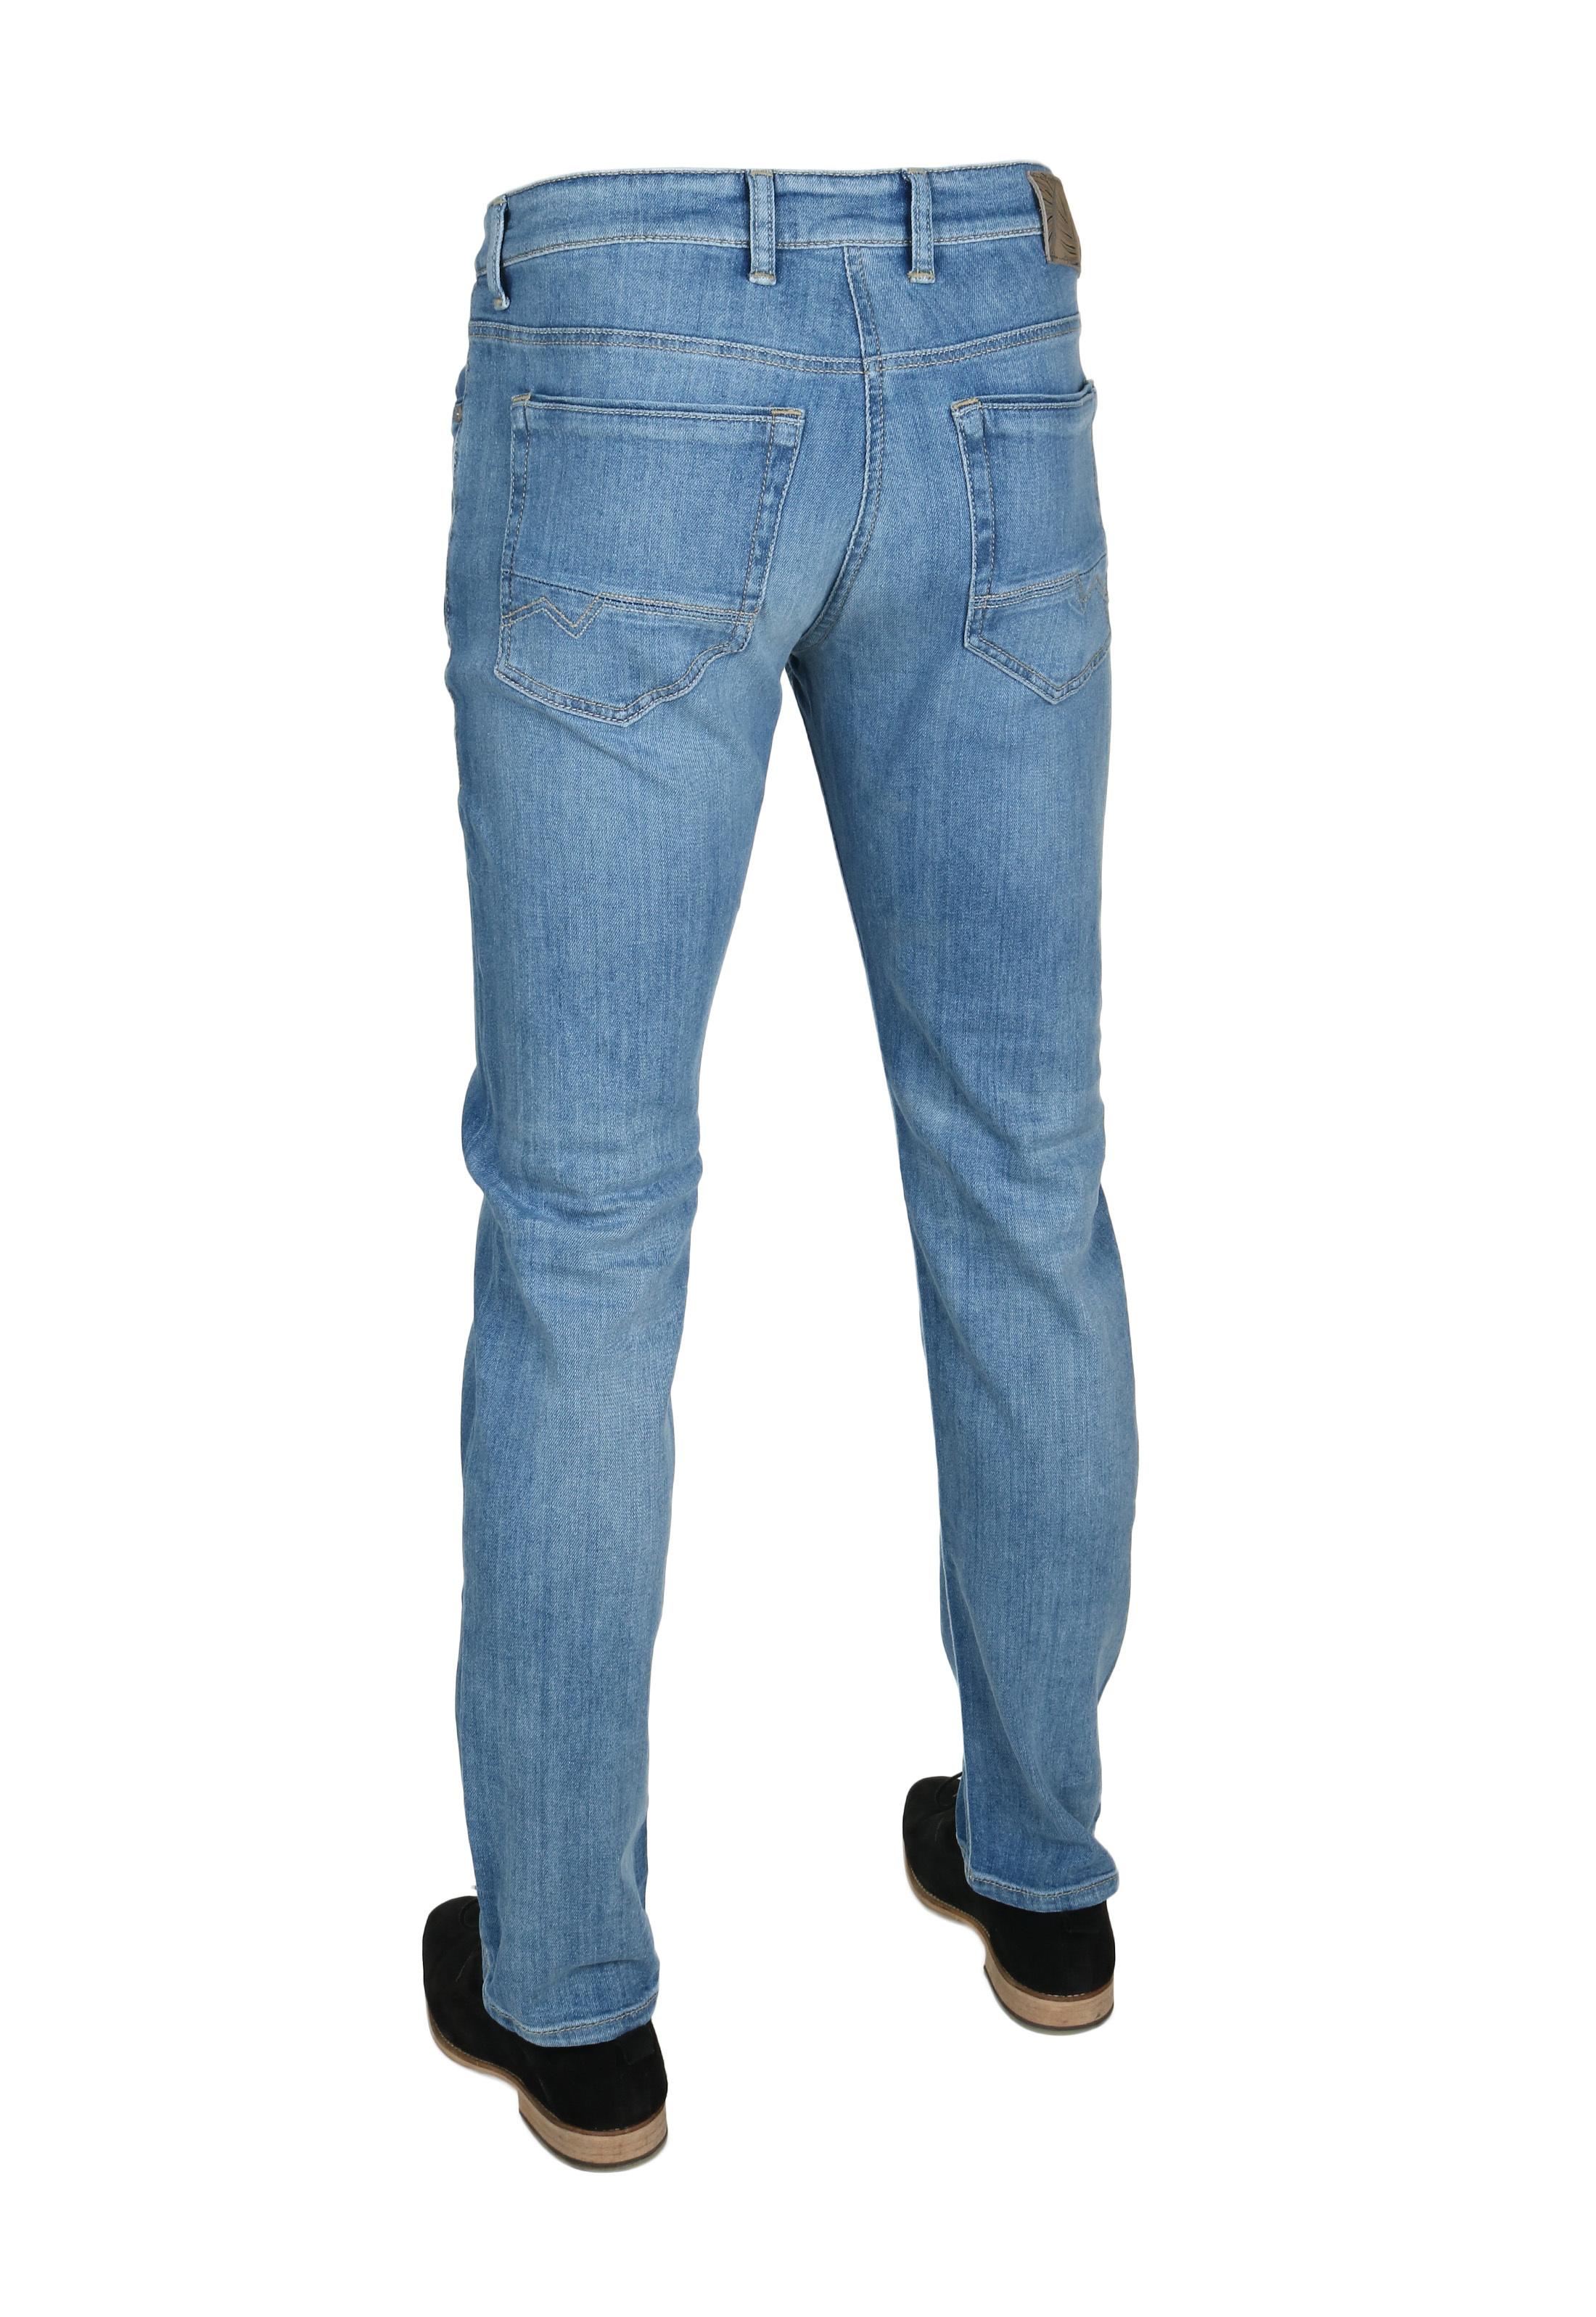 Mac Jeans Arne Pipe H243 foto 2